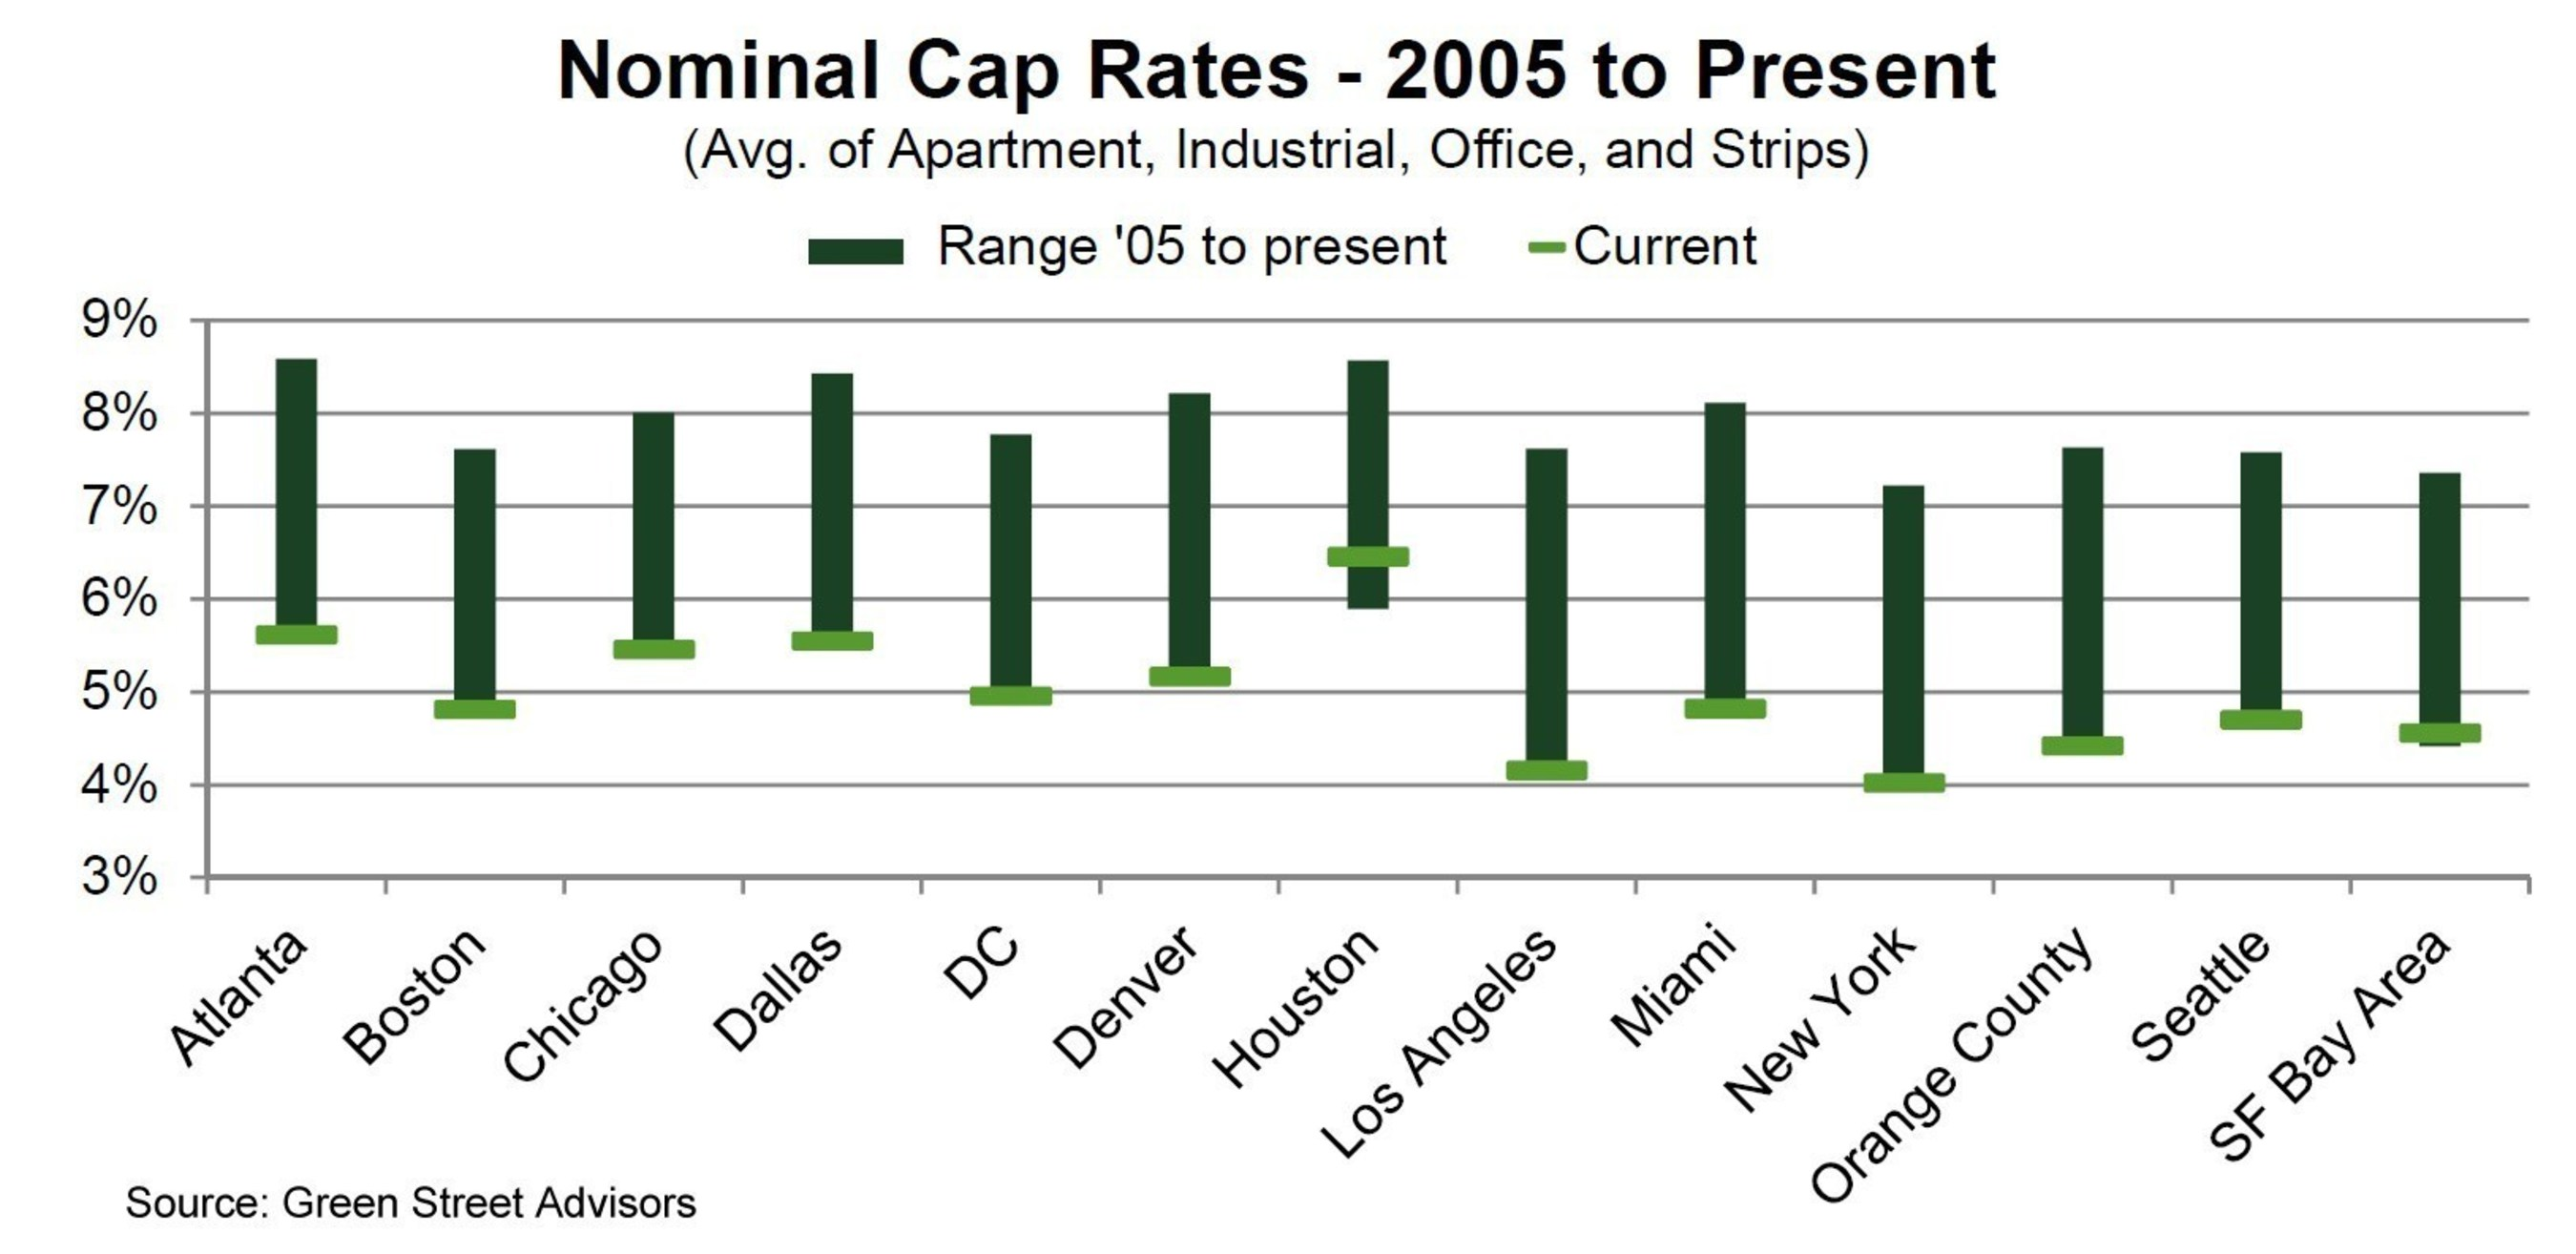 Green Street Advisors Nominal Cap Rates by Market